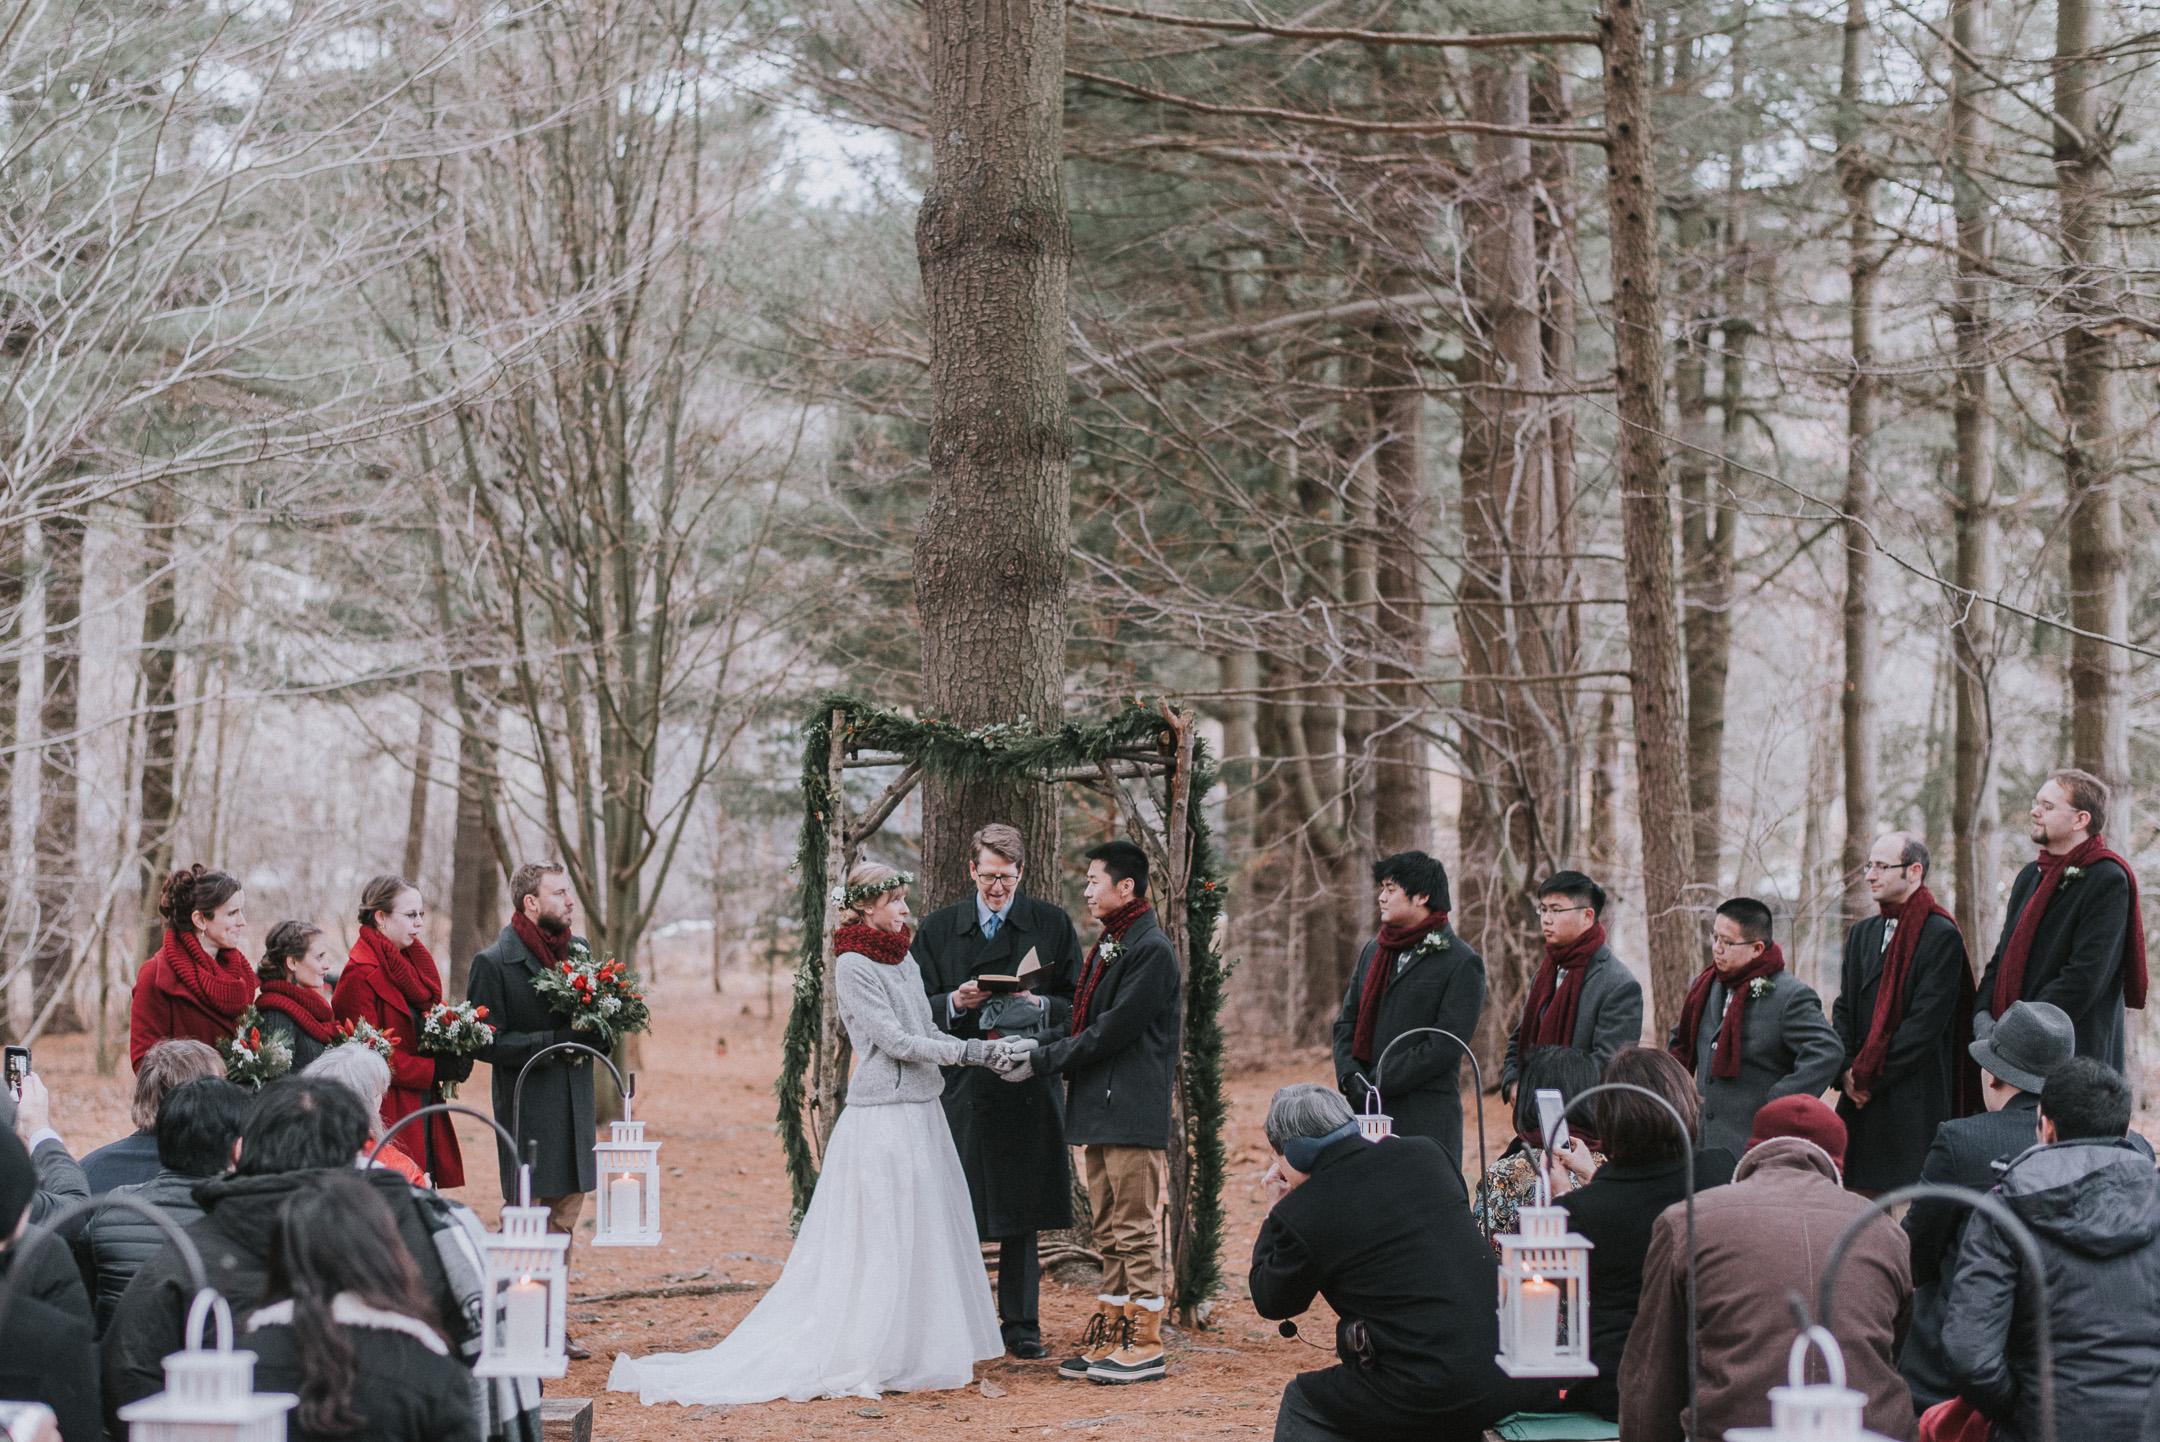 thurmont wedding photographer (17 of 38).jpg